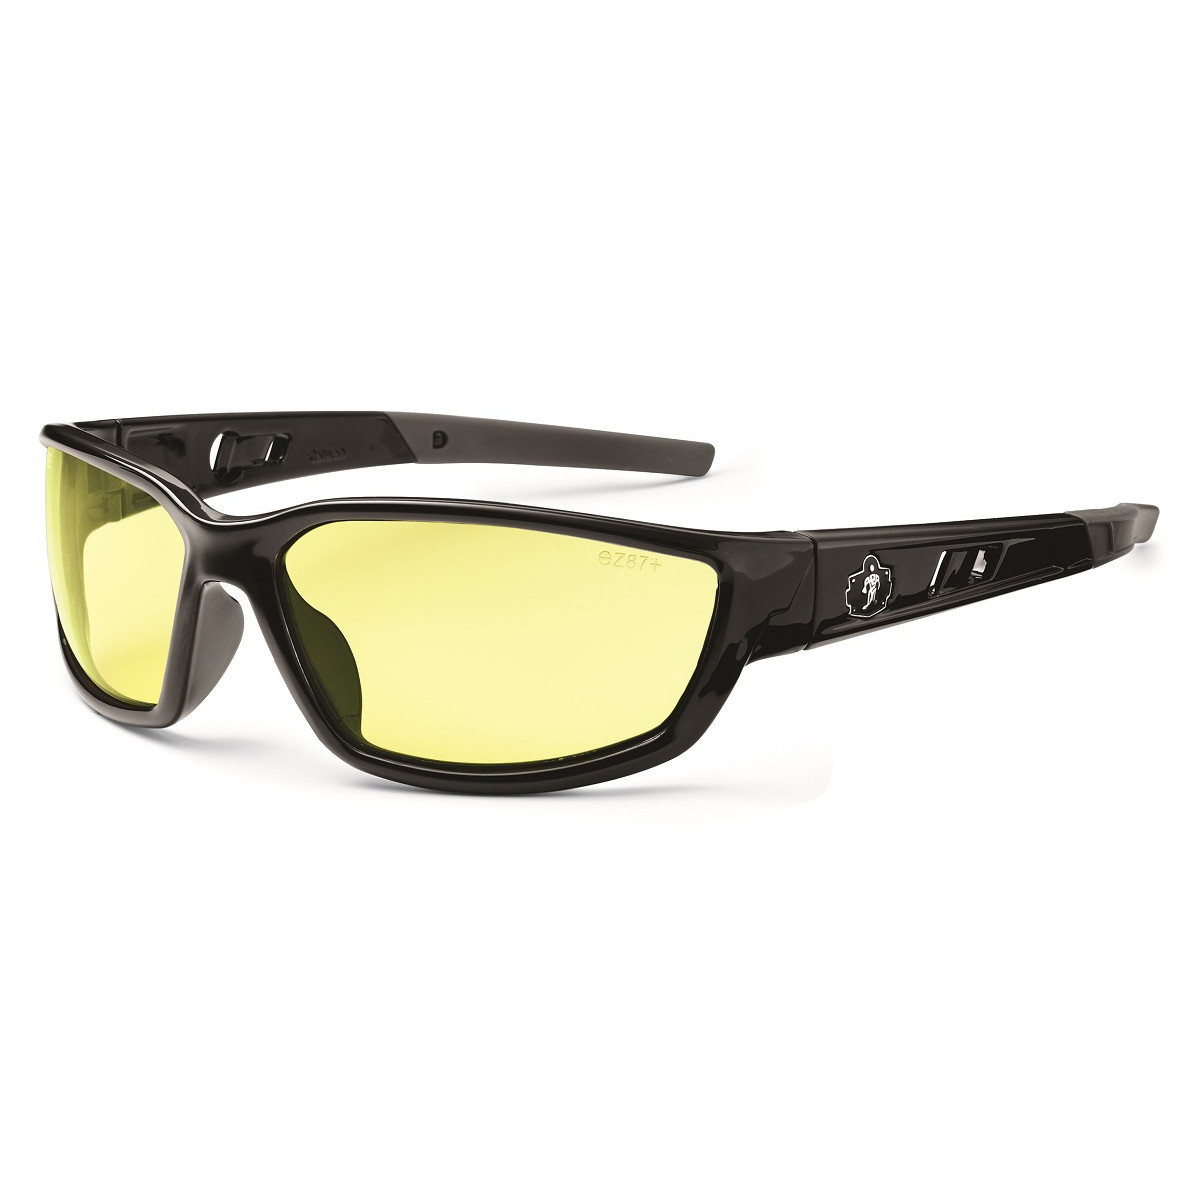 Ergodyne Kvasir 53050 Safety Glasses - Black Frame ...